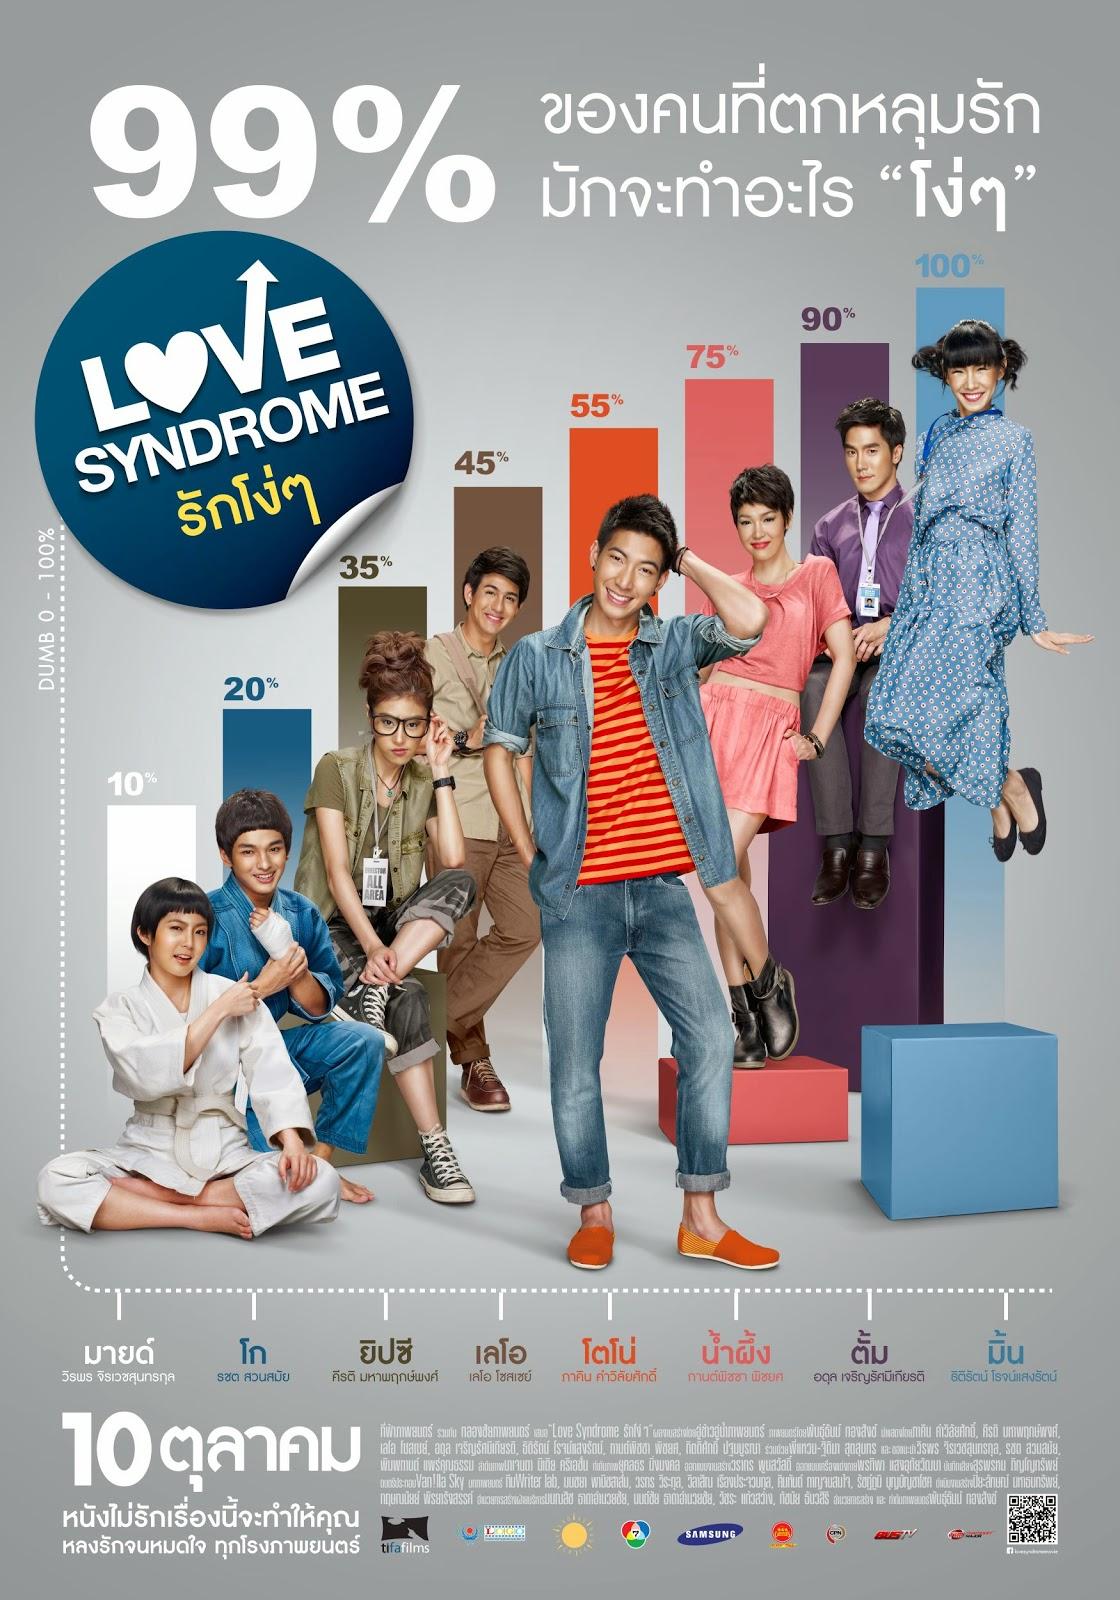 Yêu Là Yêu - Love Syndrome (2014)